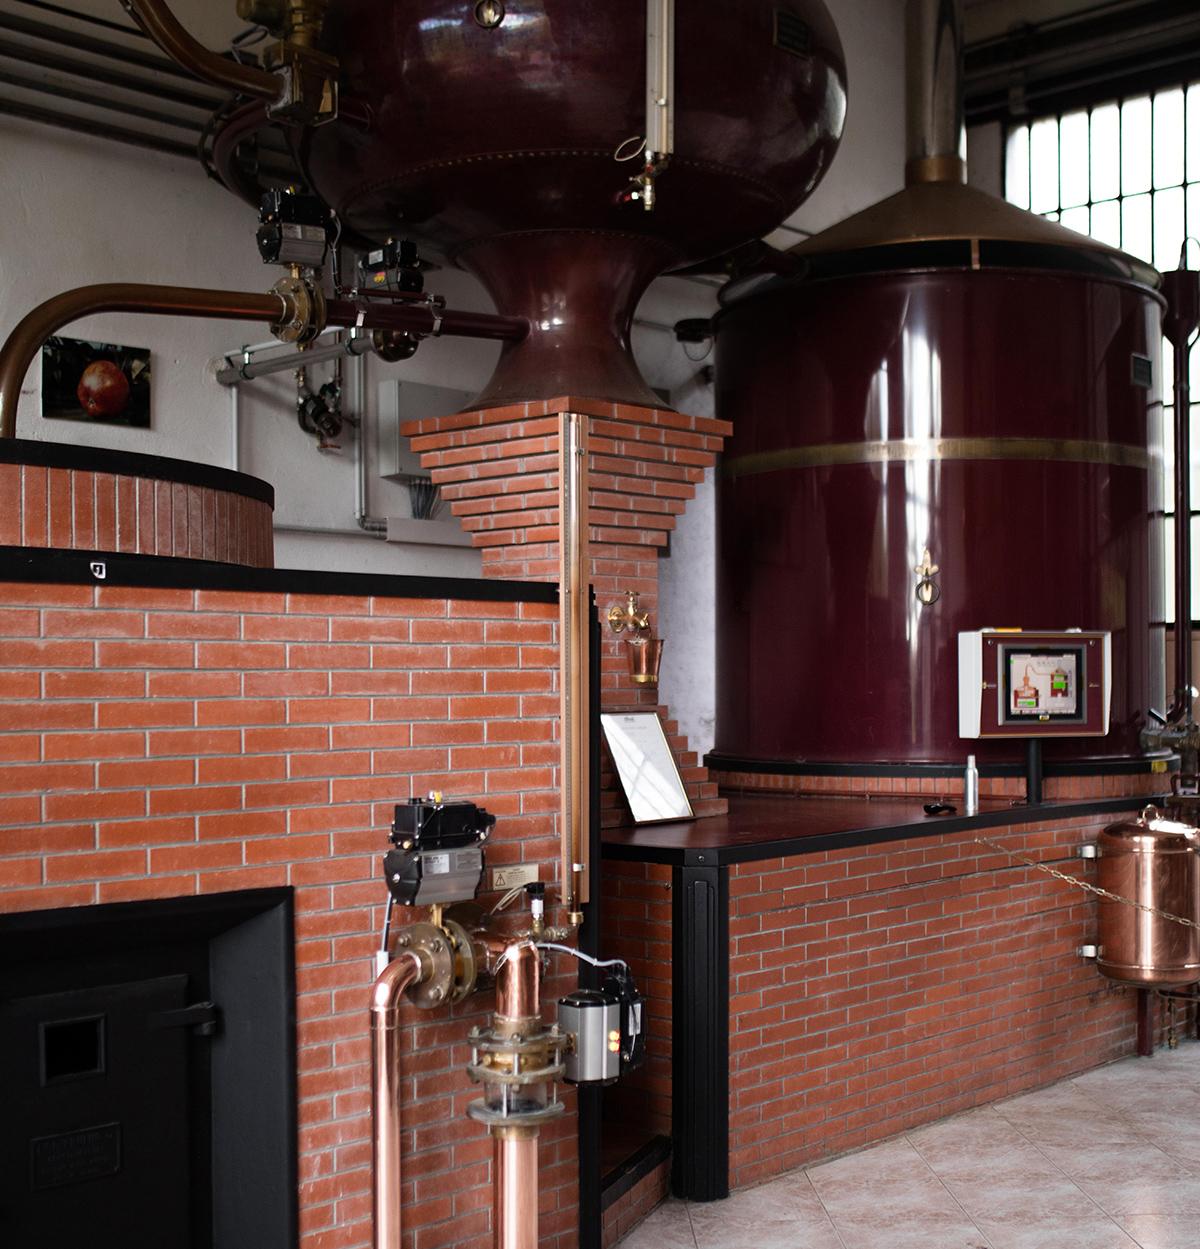 Chateau du breuil distillerie